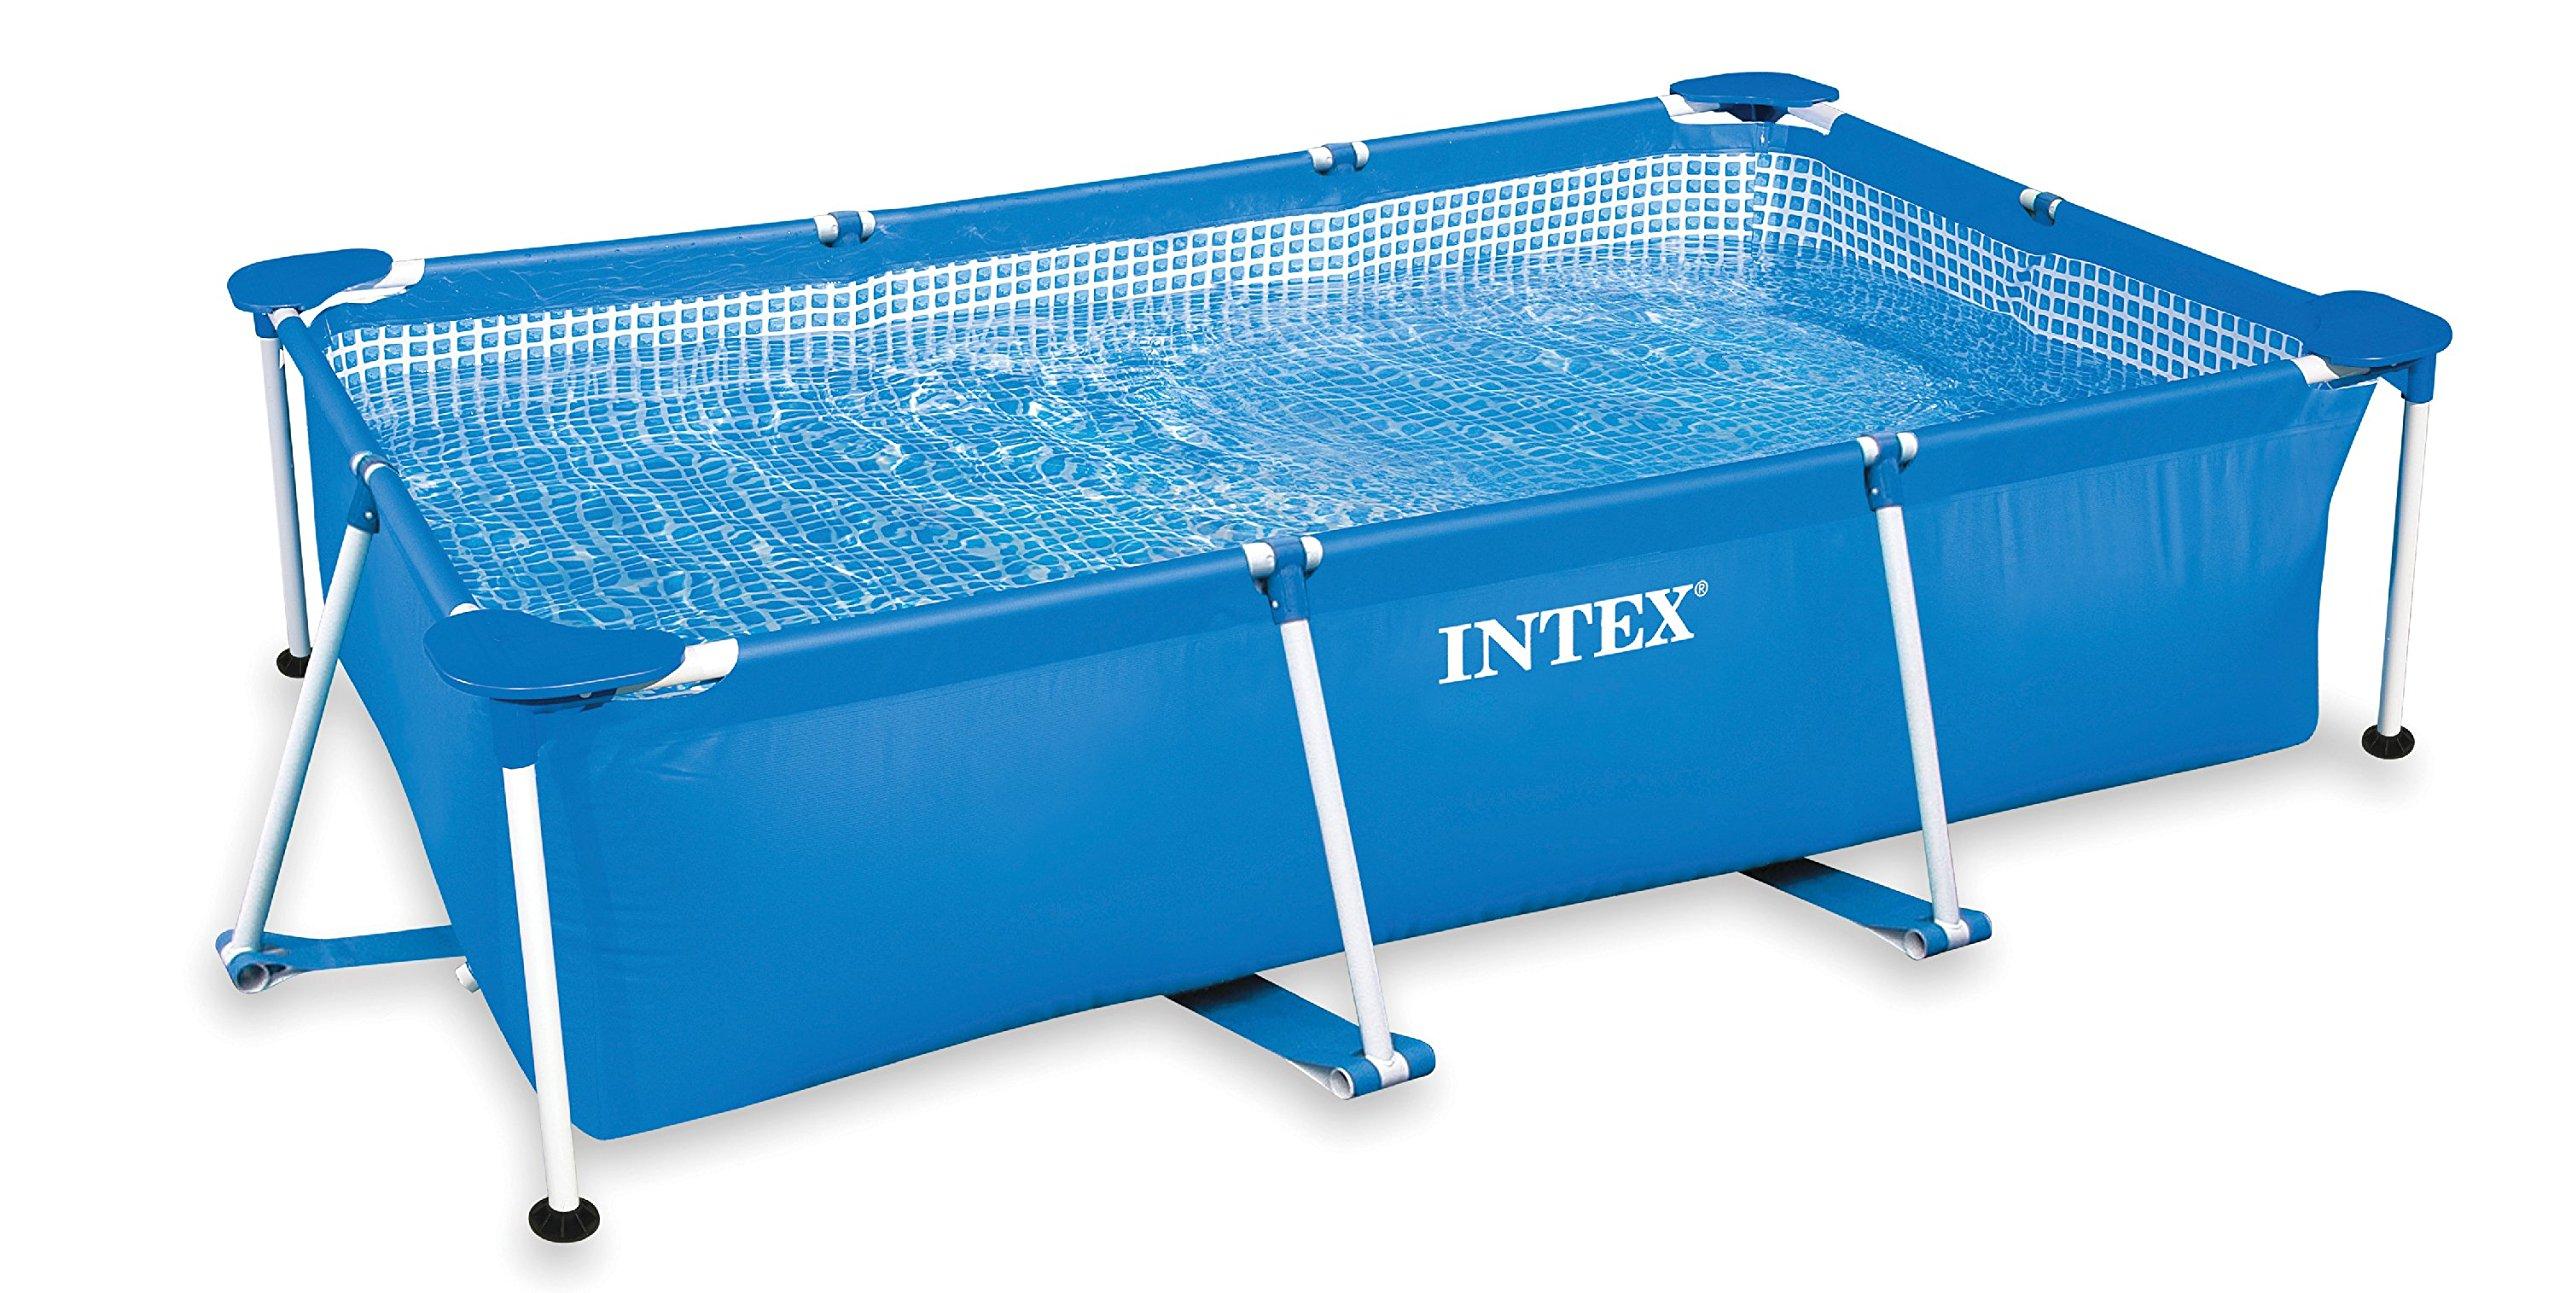 Intex 86'' x 59'' x 23'' Rectangular Frame Above Ground Baby Splash Pool | 28270E